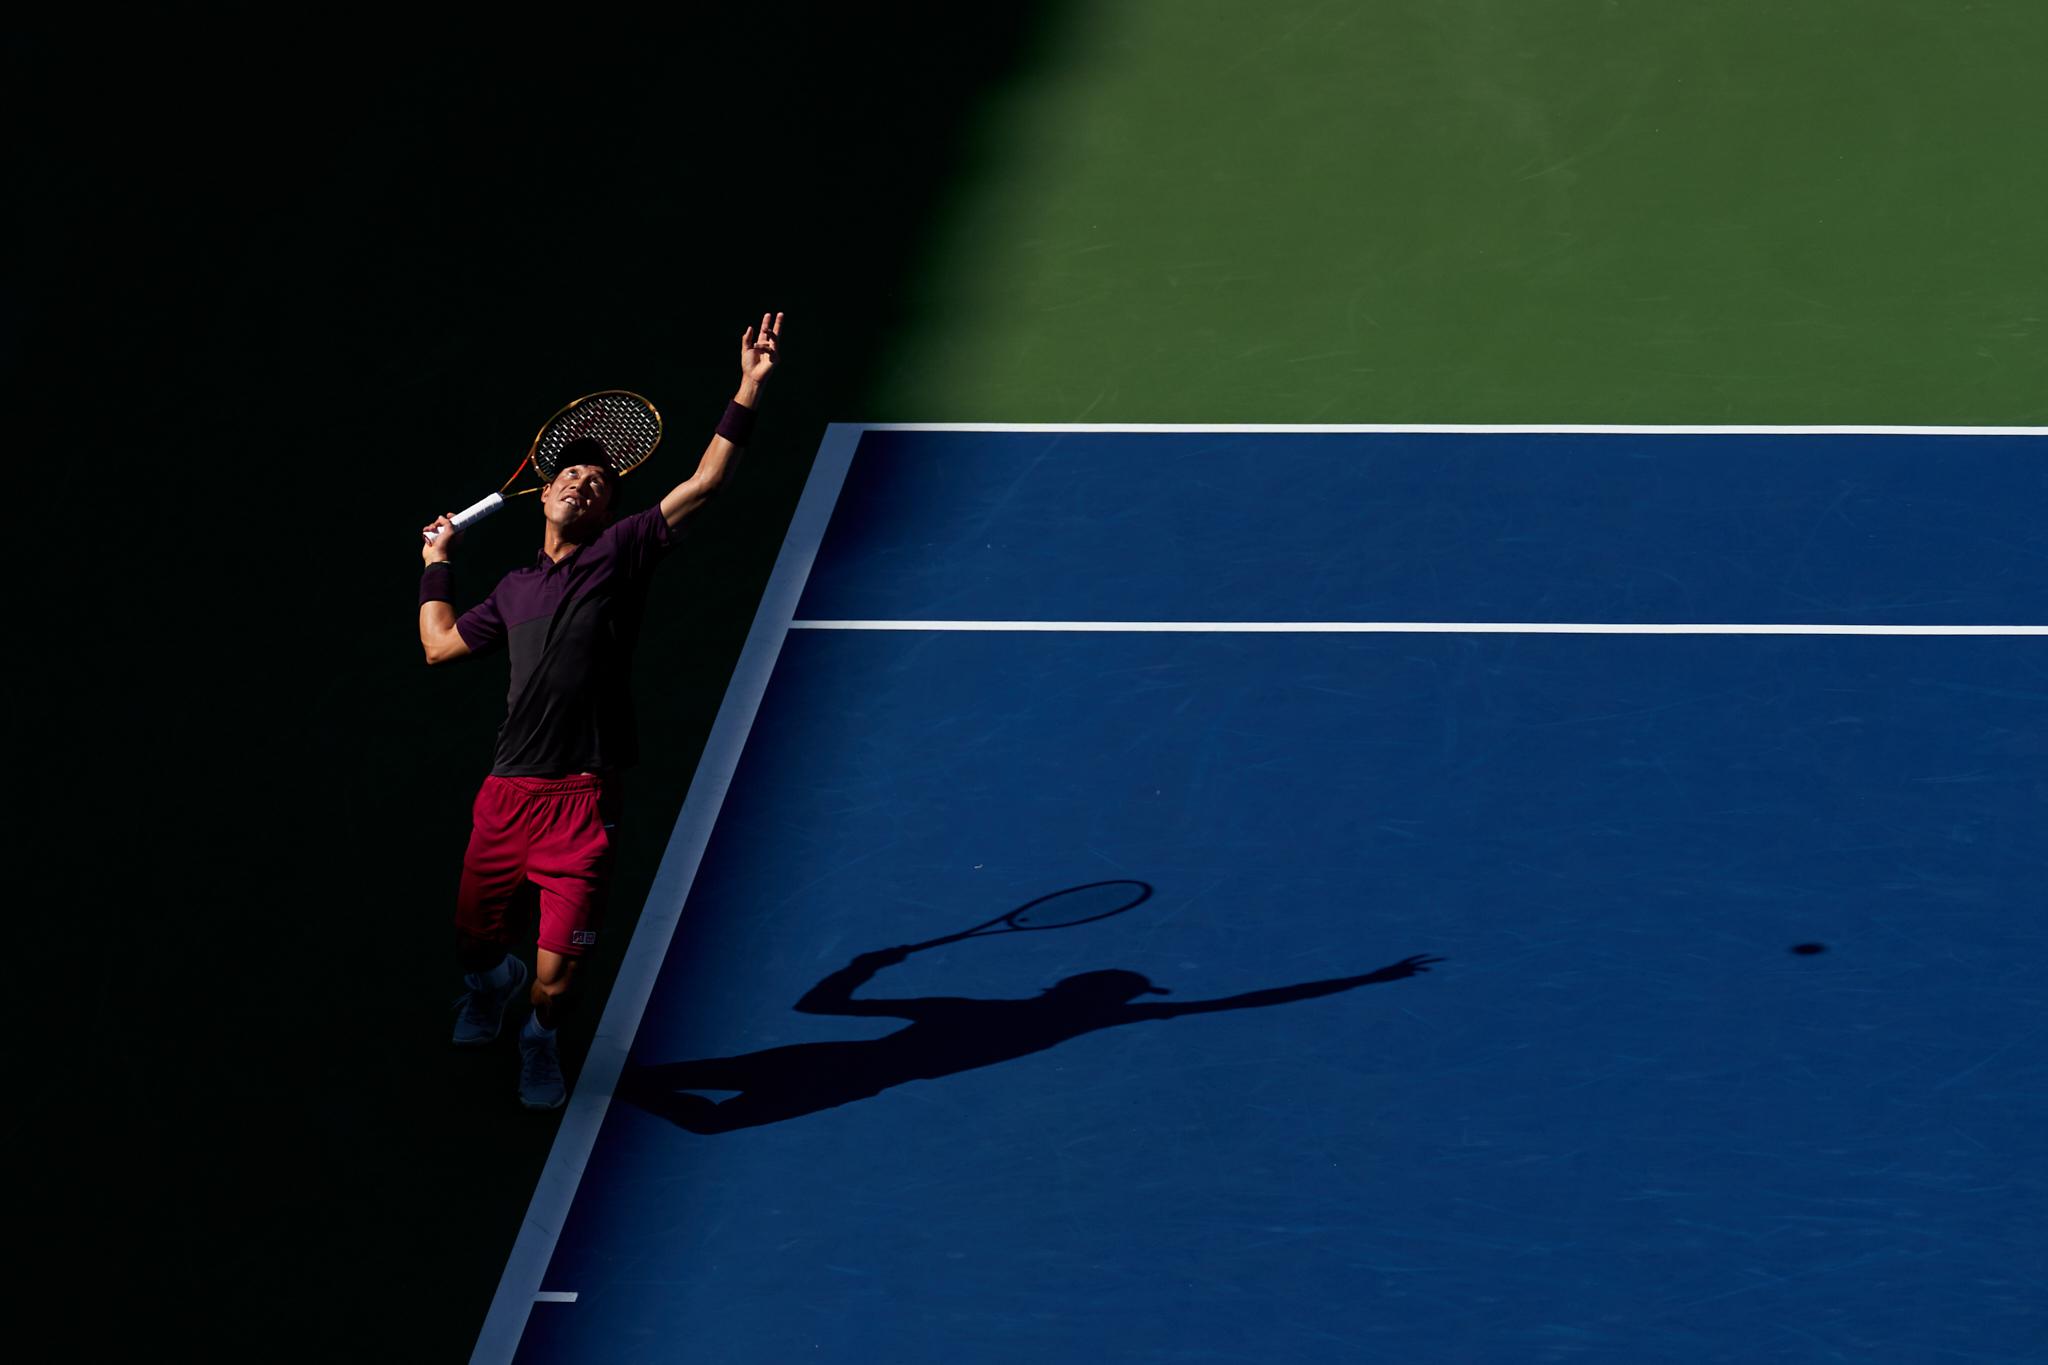 Kei Nishikori, Louis Armstrong Stadium, 4th round Men's Singles  Sony A9, Sony 100-400mm f4.5-5.6 GM-OSS